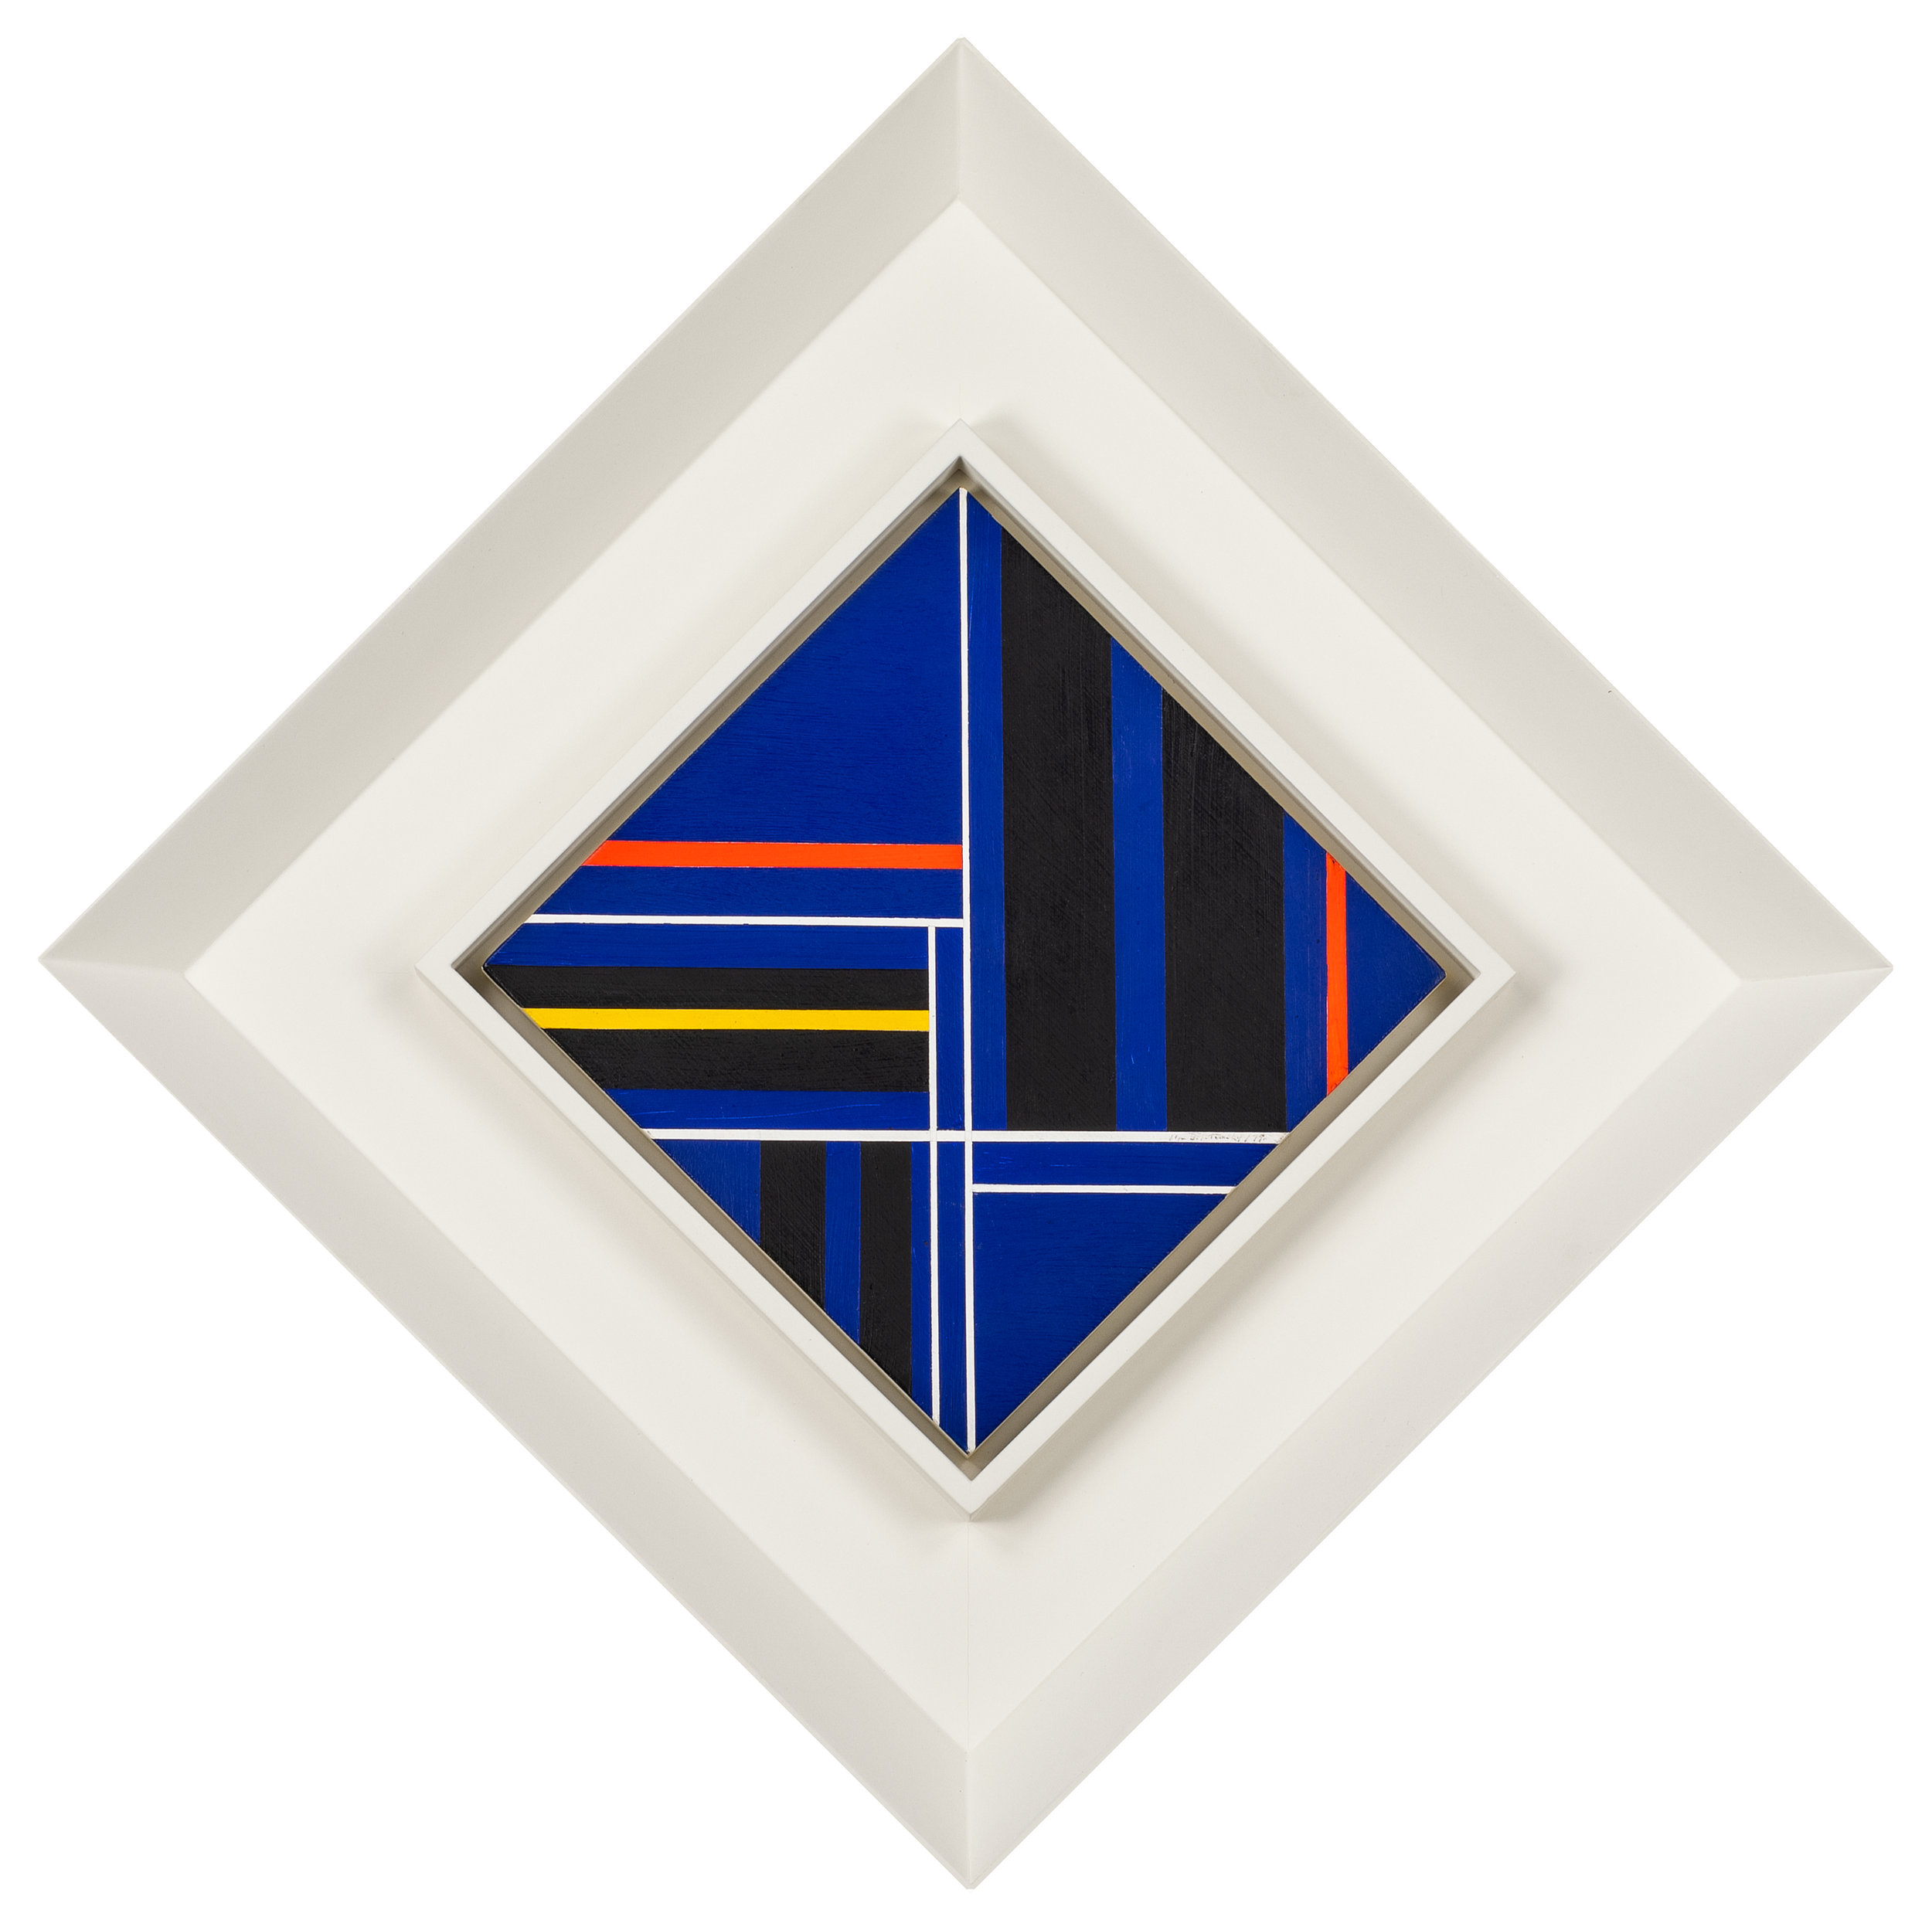 SOLD  Deep Blue Diamond,   Acrylic on panel, 1979, 12 x 12 inches